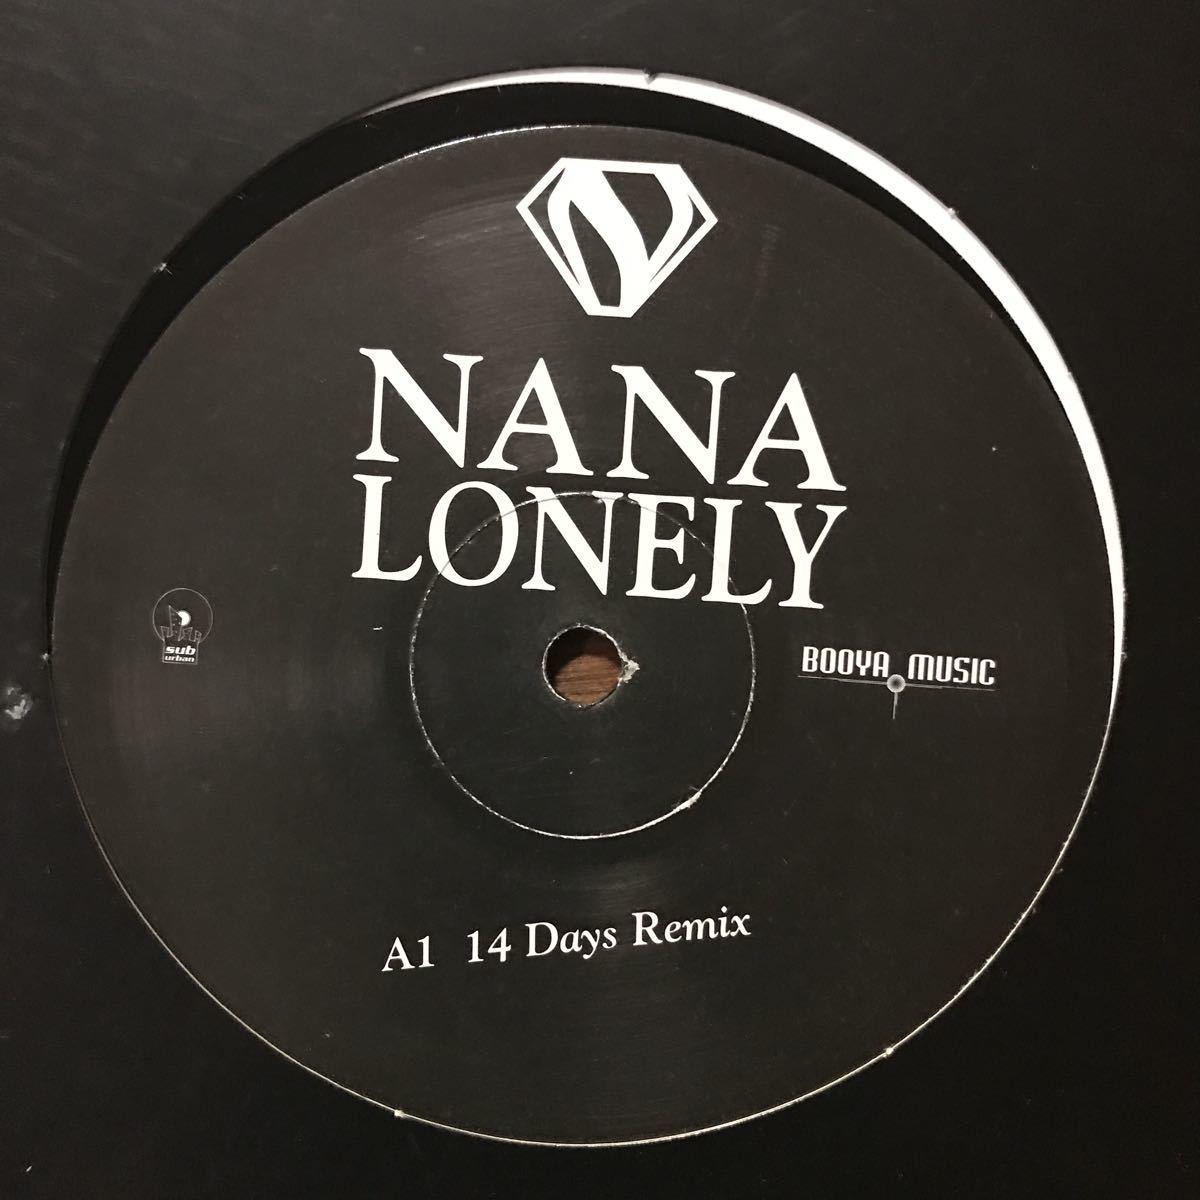 【eu-rap】Nana / Lonely[12inch]オリジナル盤《3-2-84》